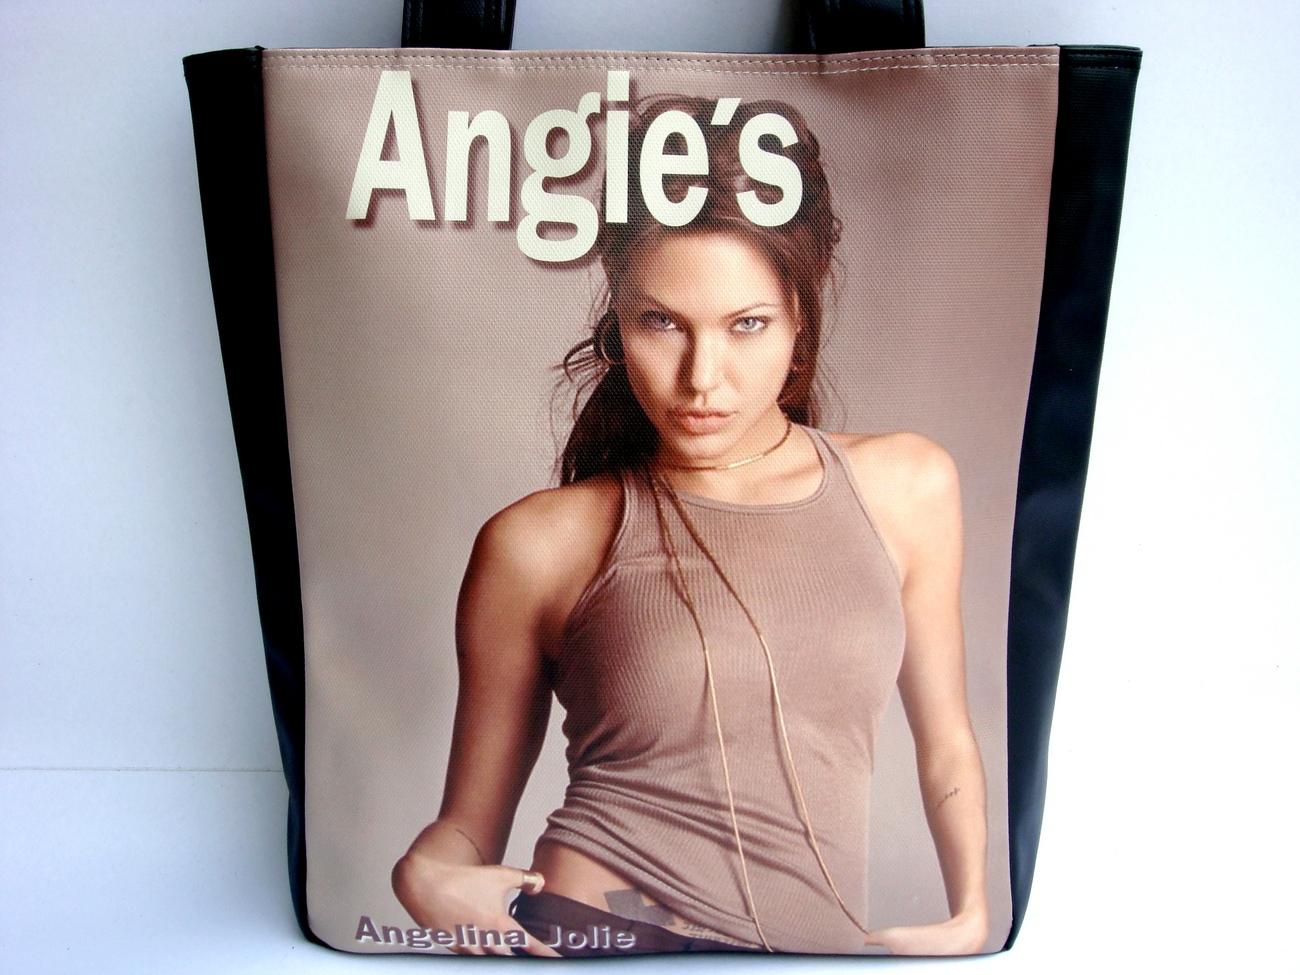 Angelina jolie d